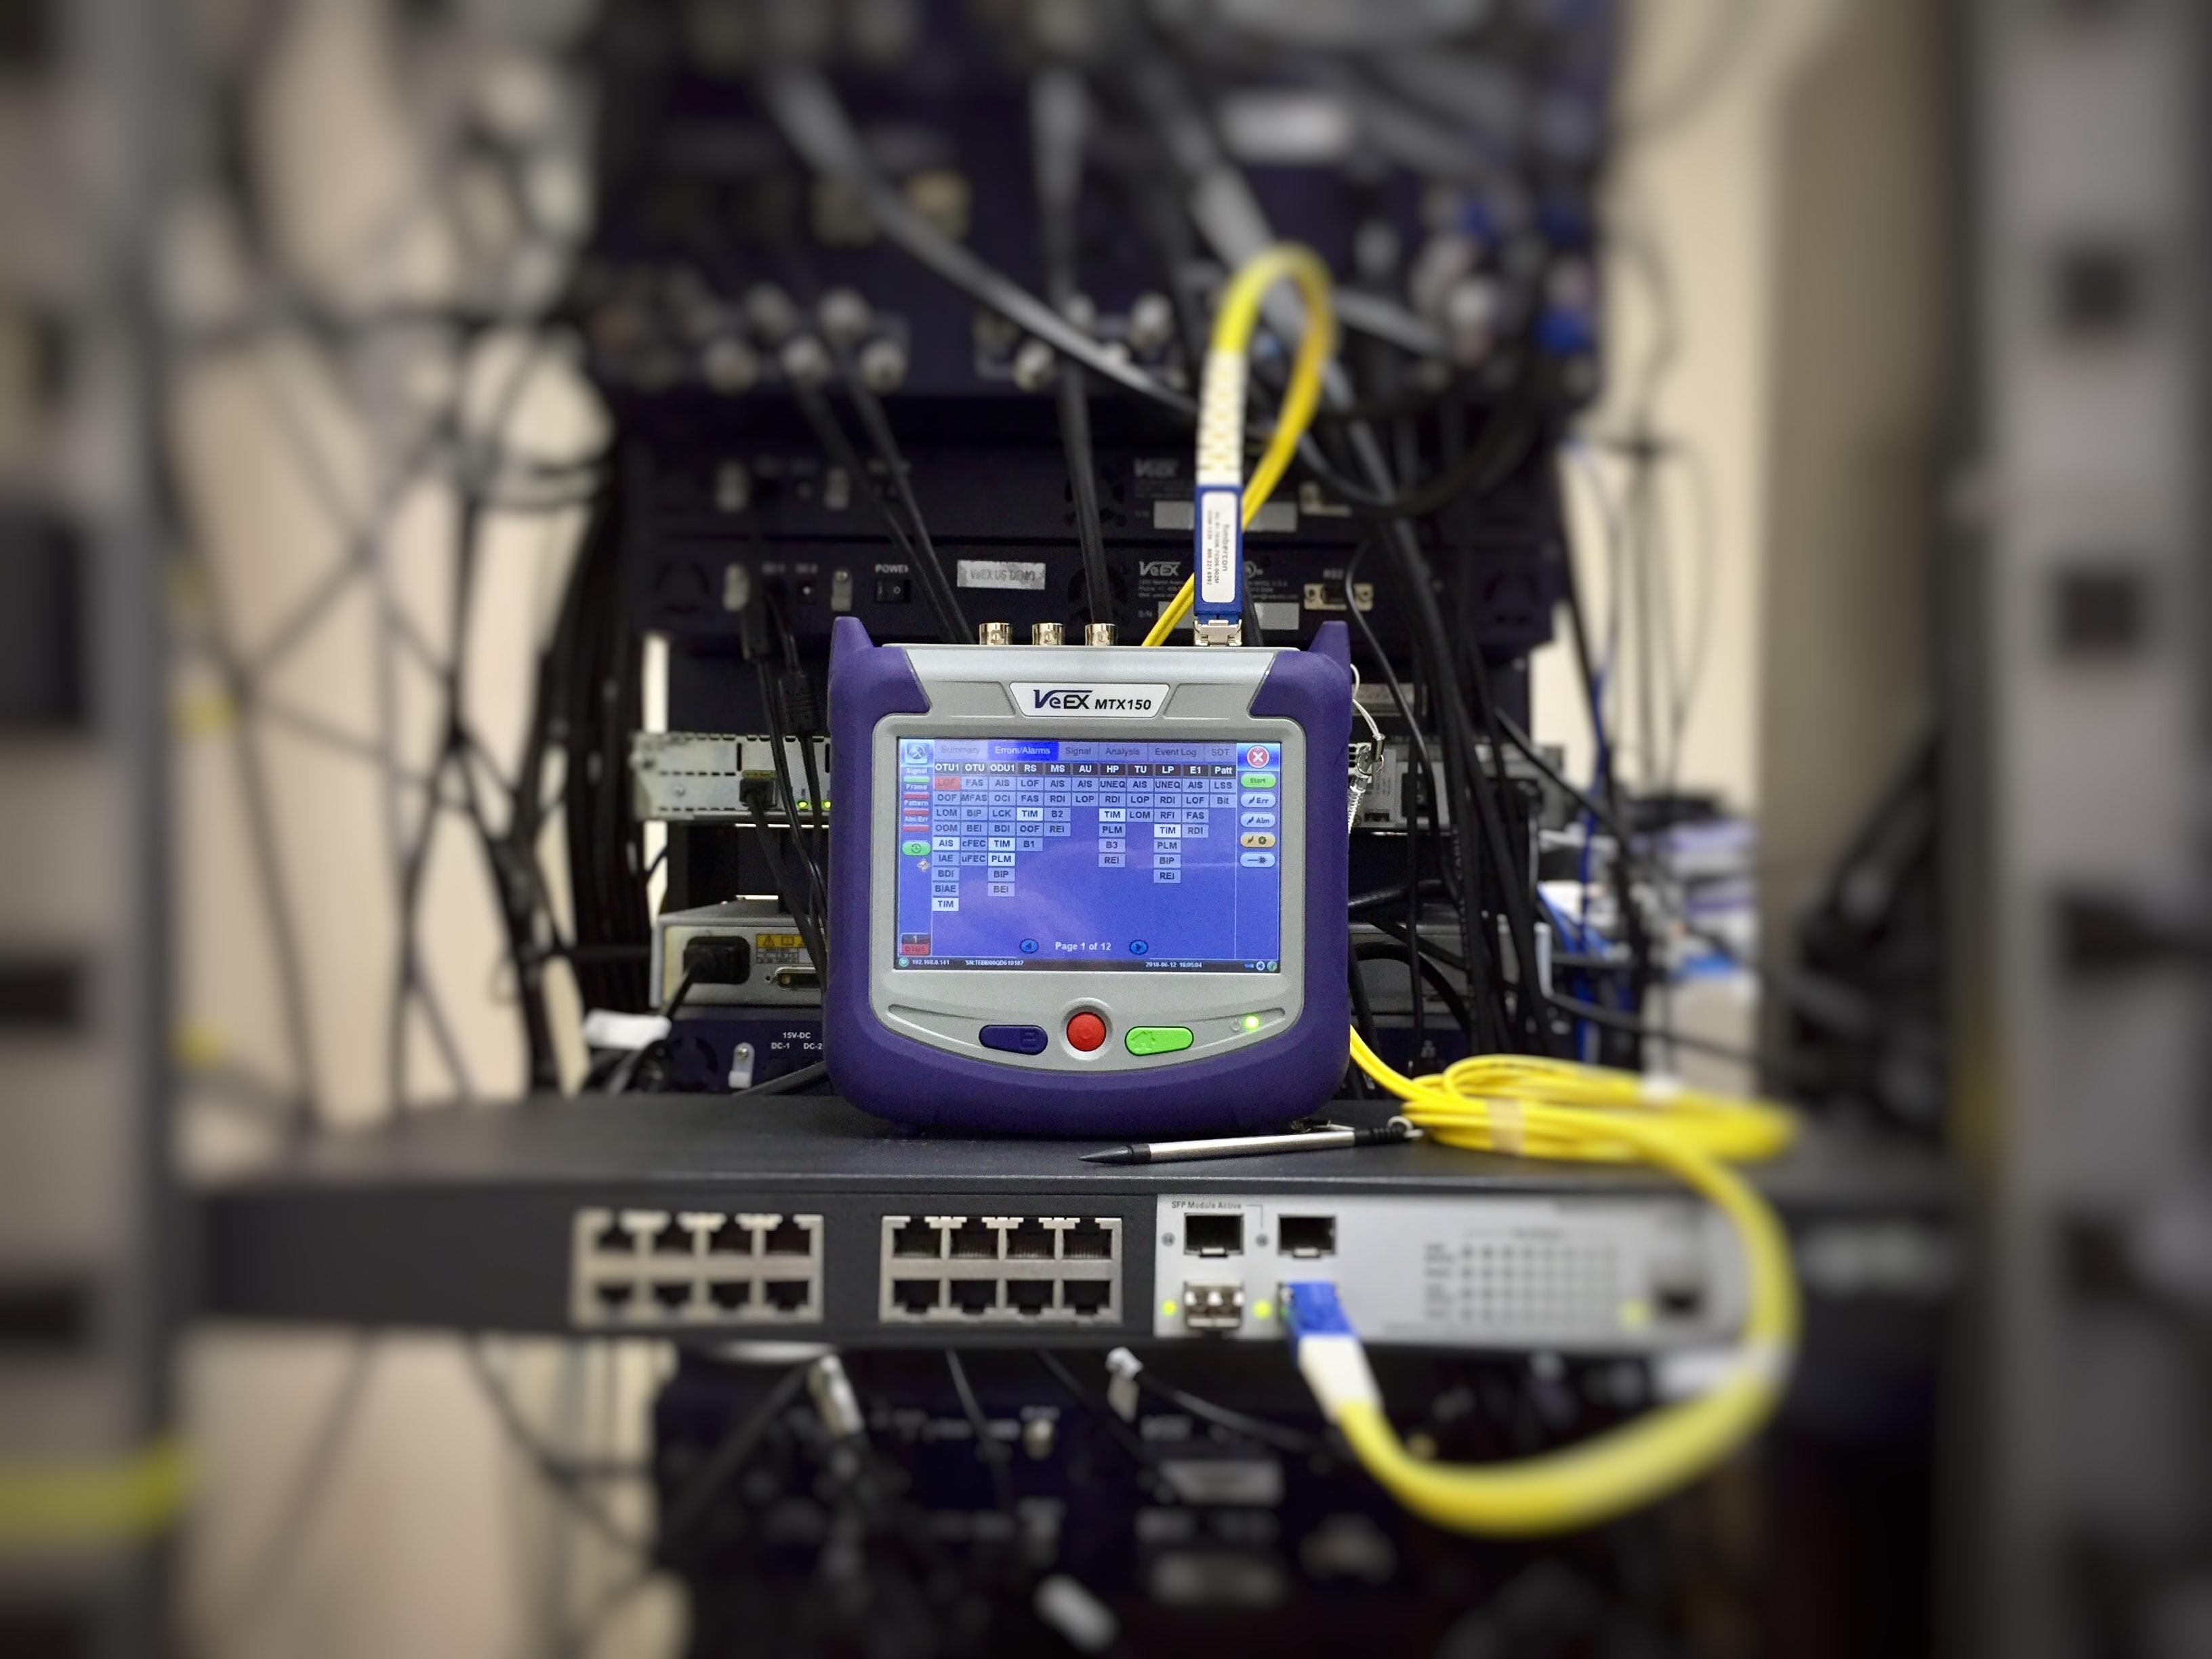 Fiber optic network | Photo by Ildefonso Polo on Unsplash